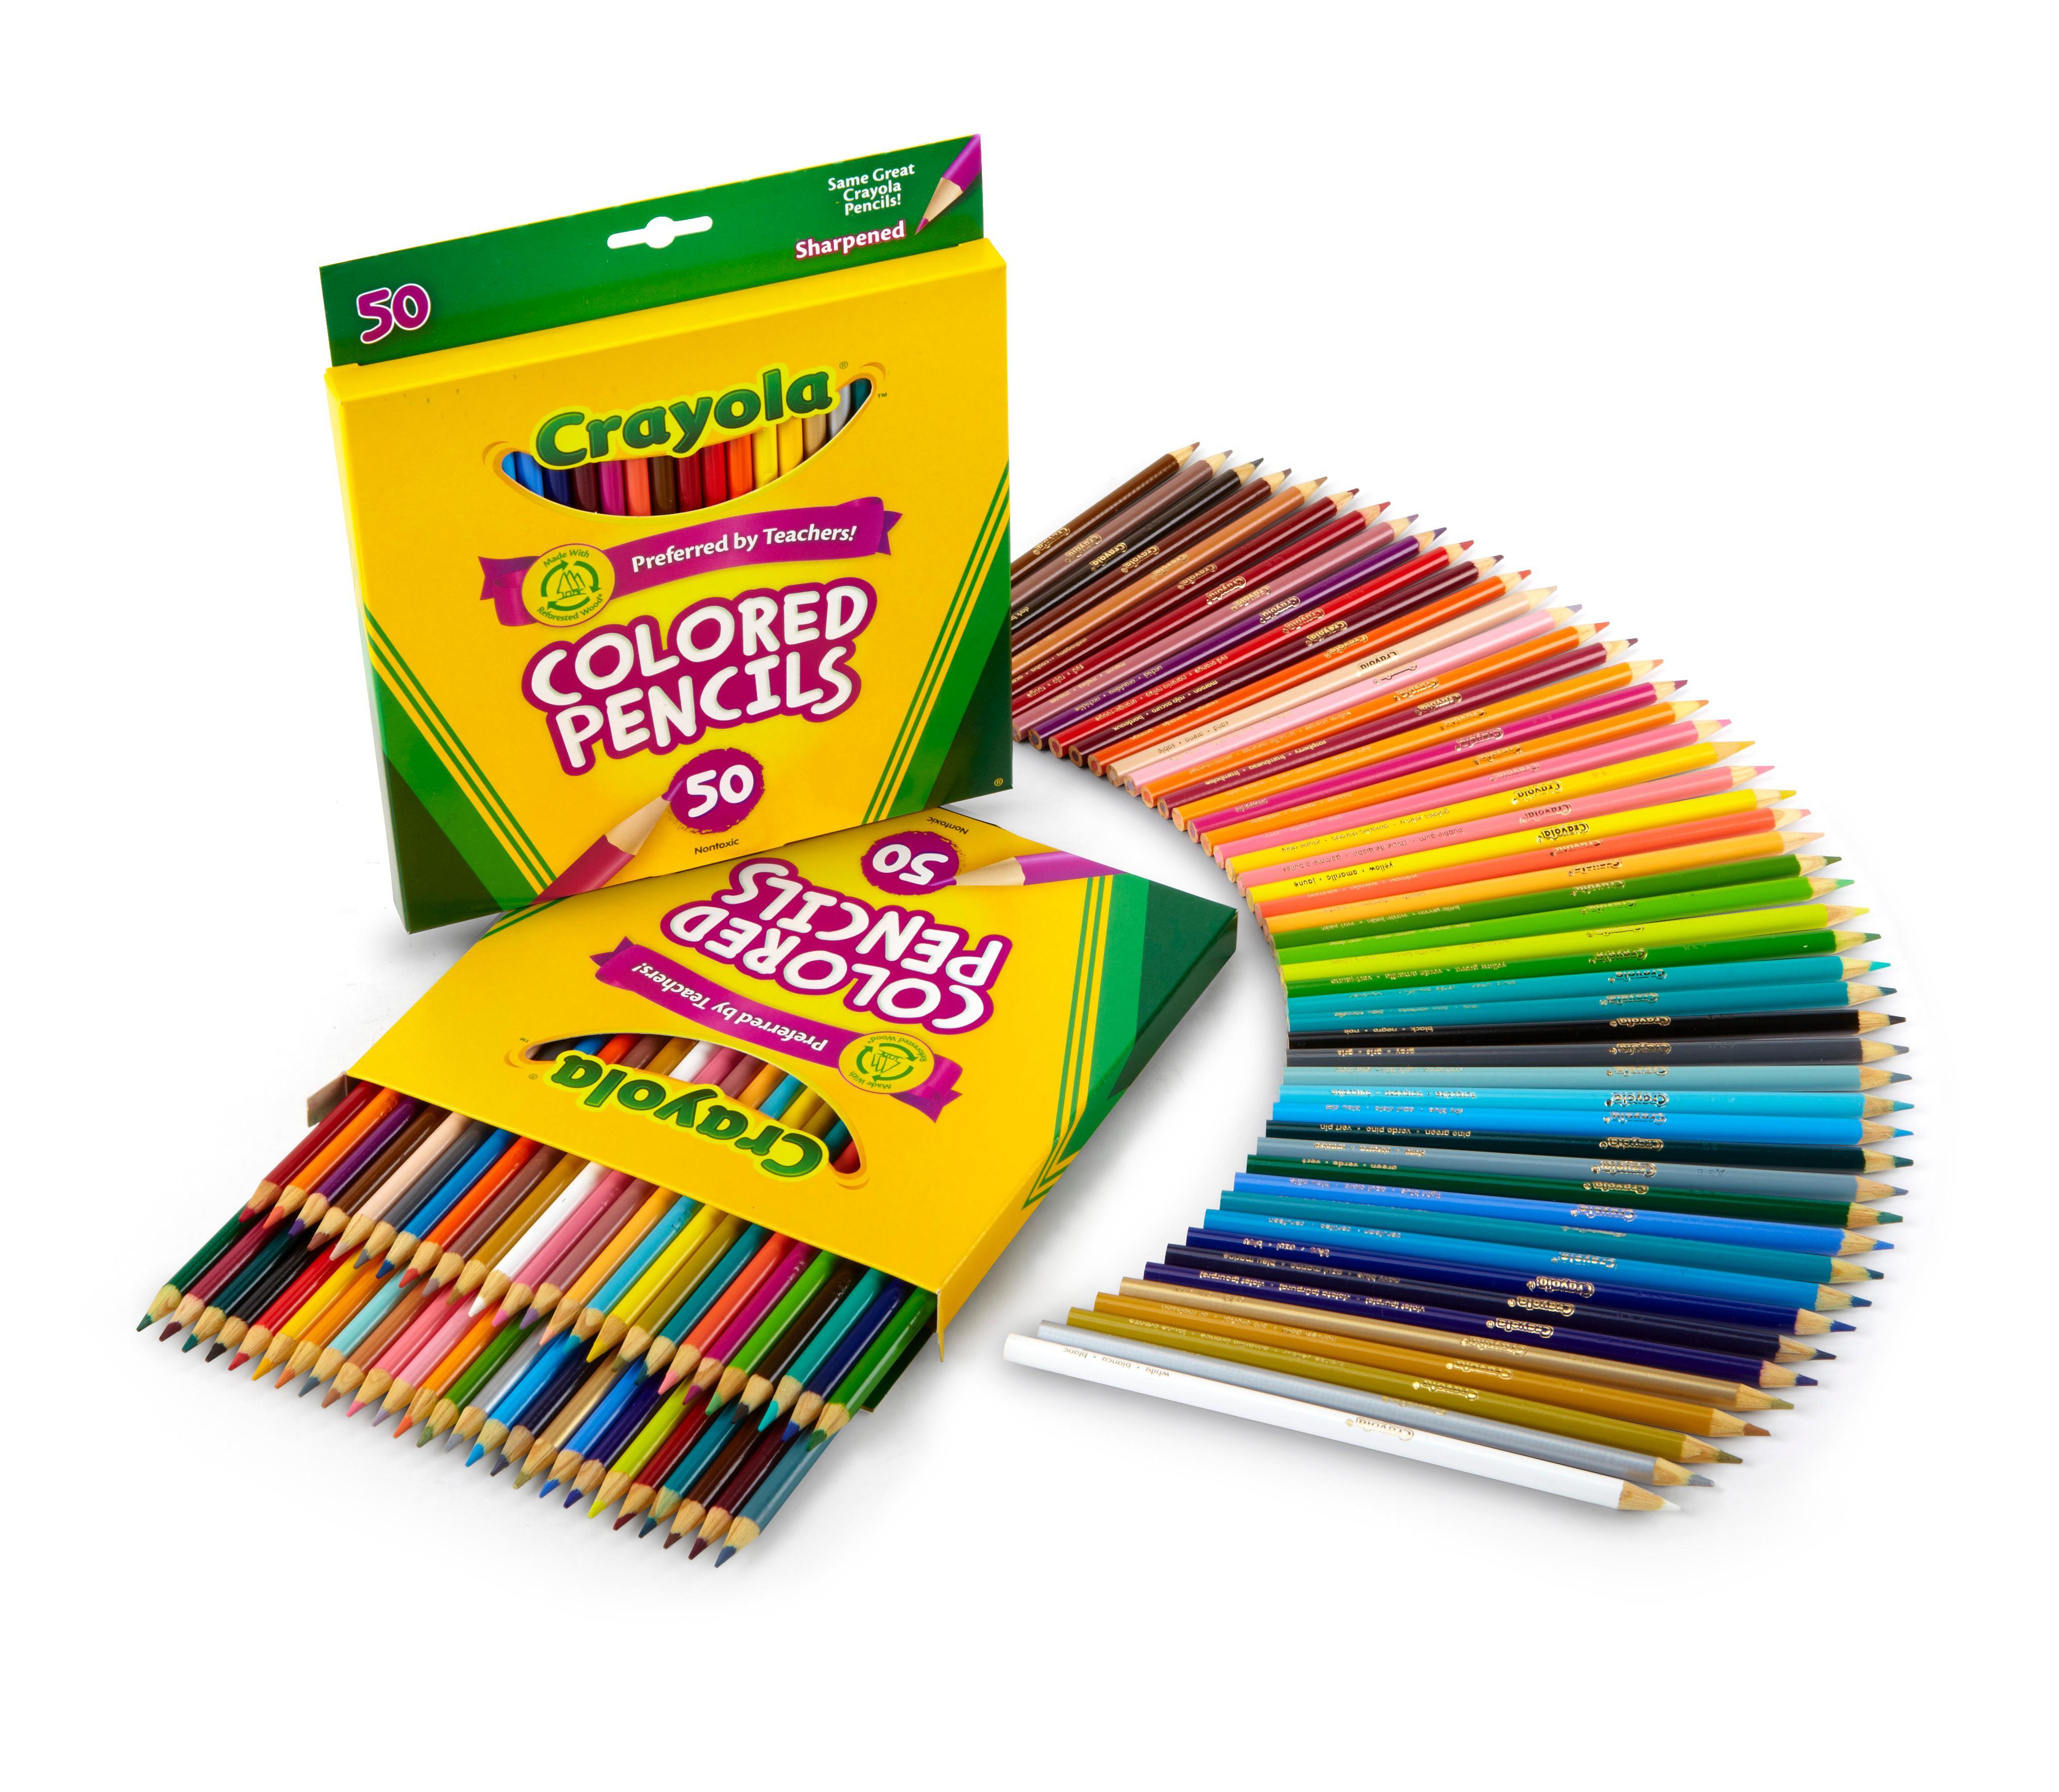 Walmart Kitchen Islands Crayola 50 Count Colored Pencils 28 Images Crayola